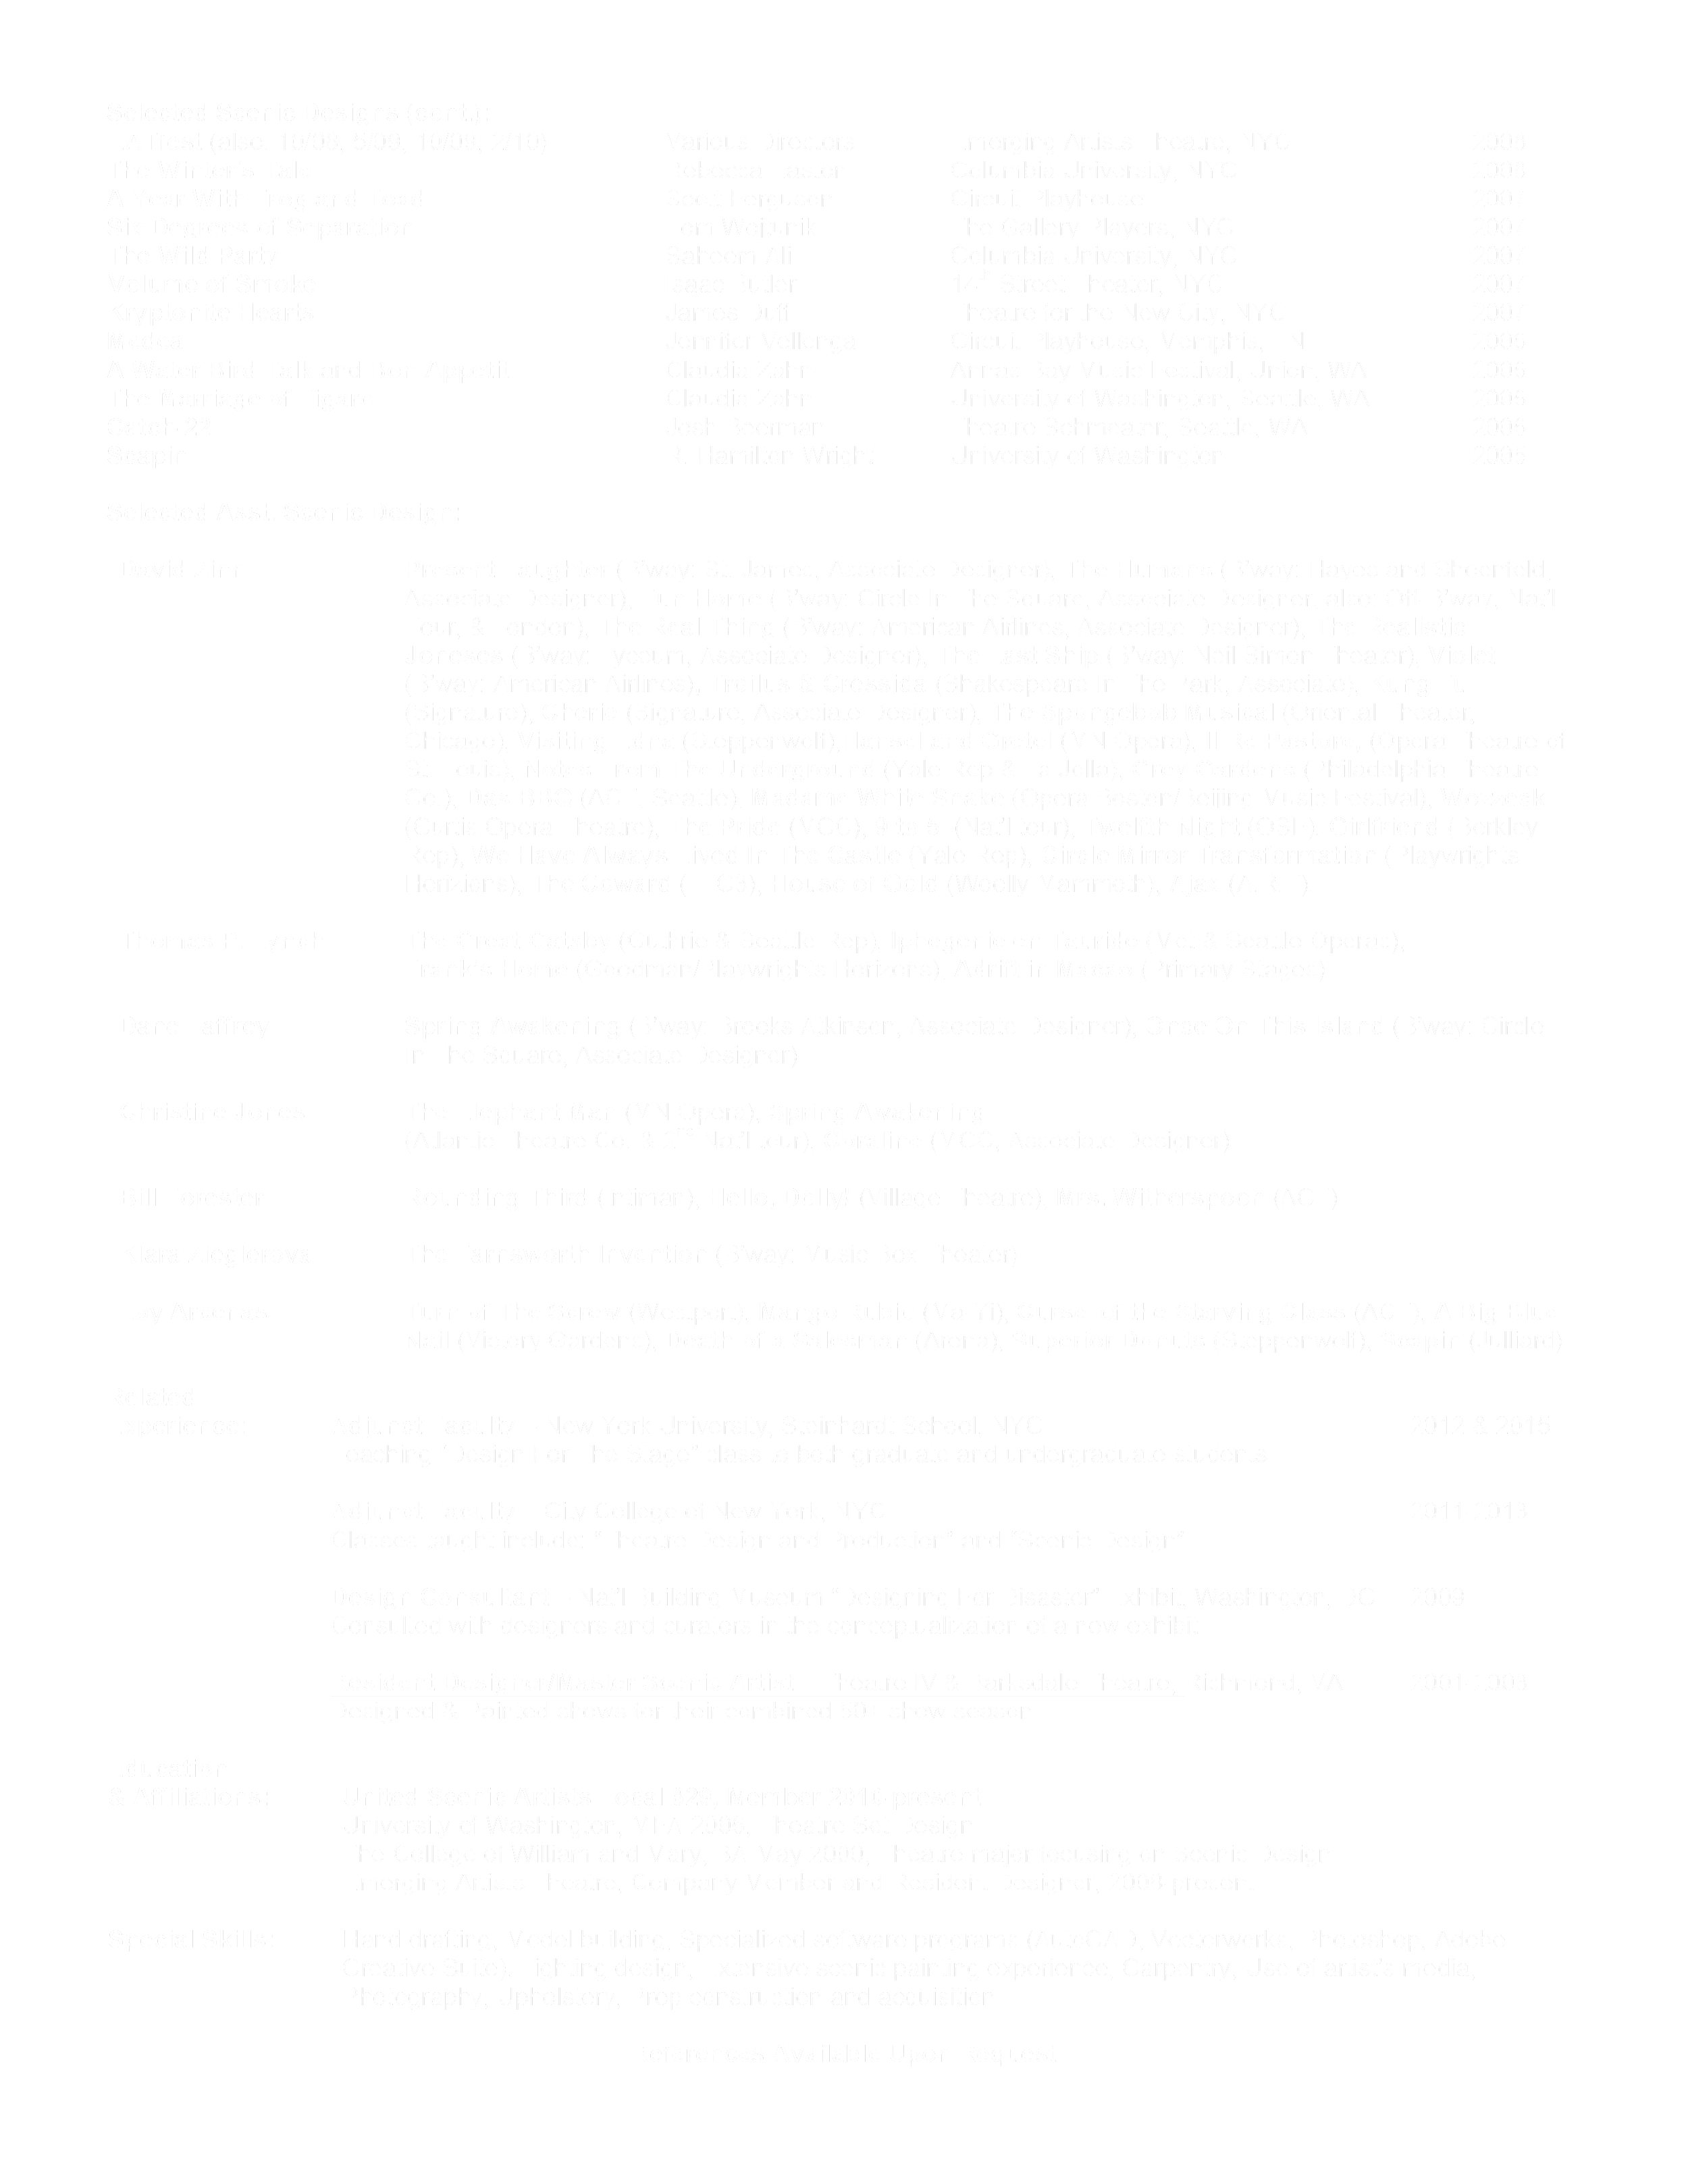 McMath Resume-2.png